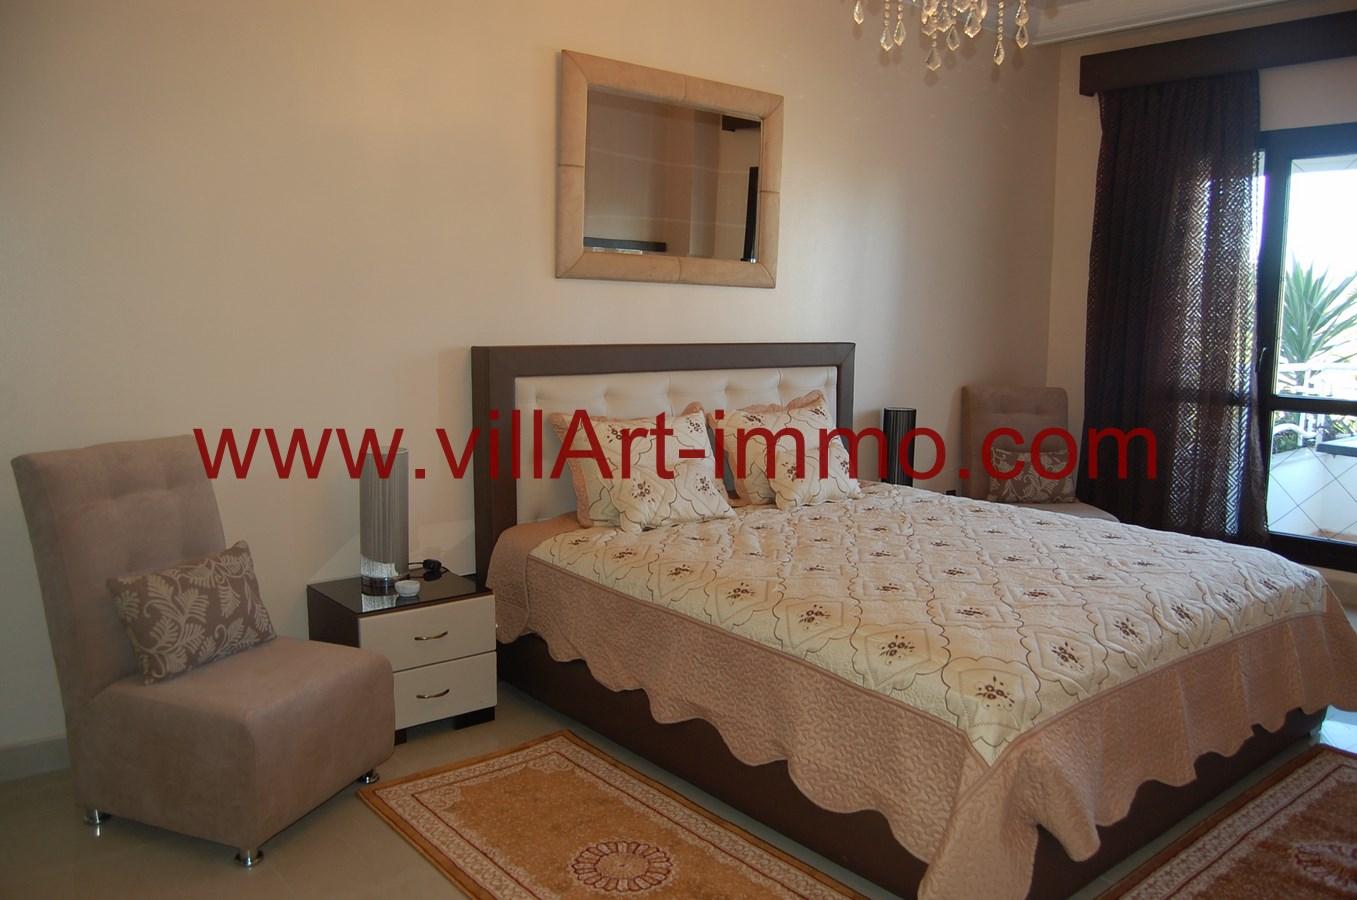 13-location-appartement-meuble-iberia-tanger-chambre-3-l895-villart-immo